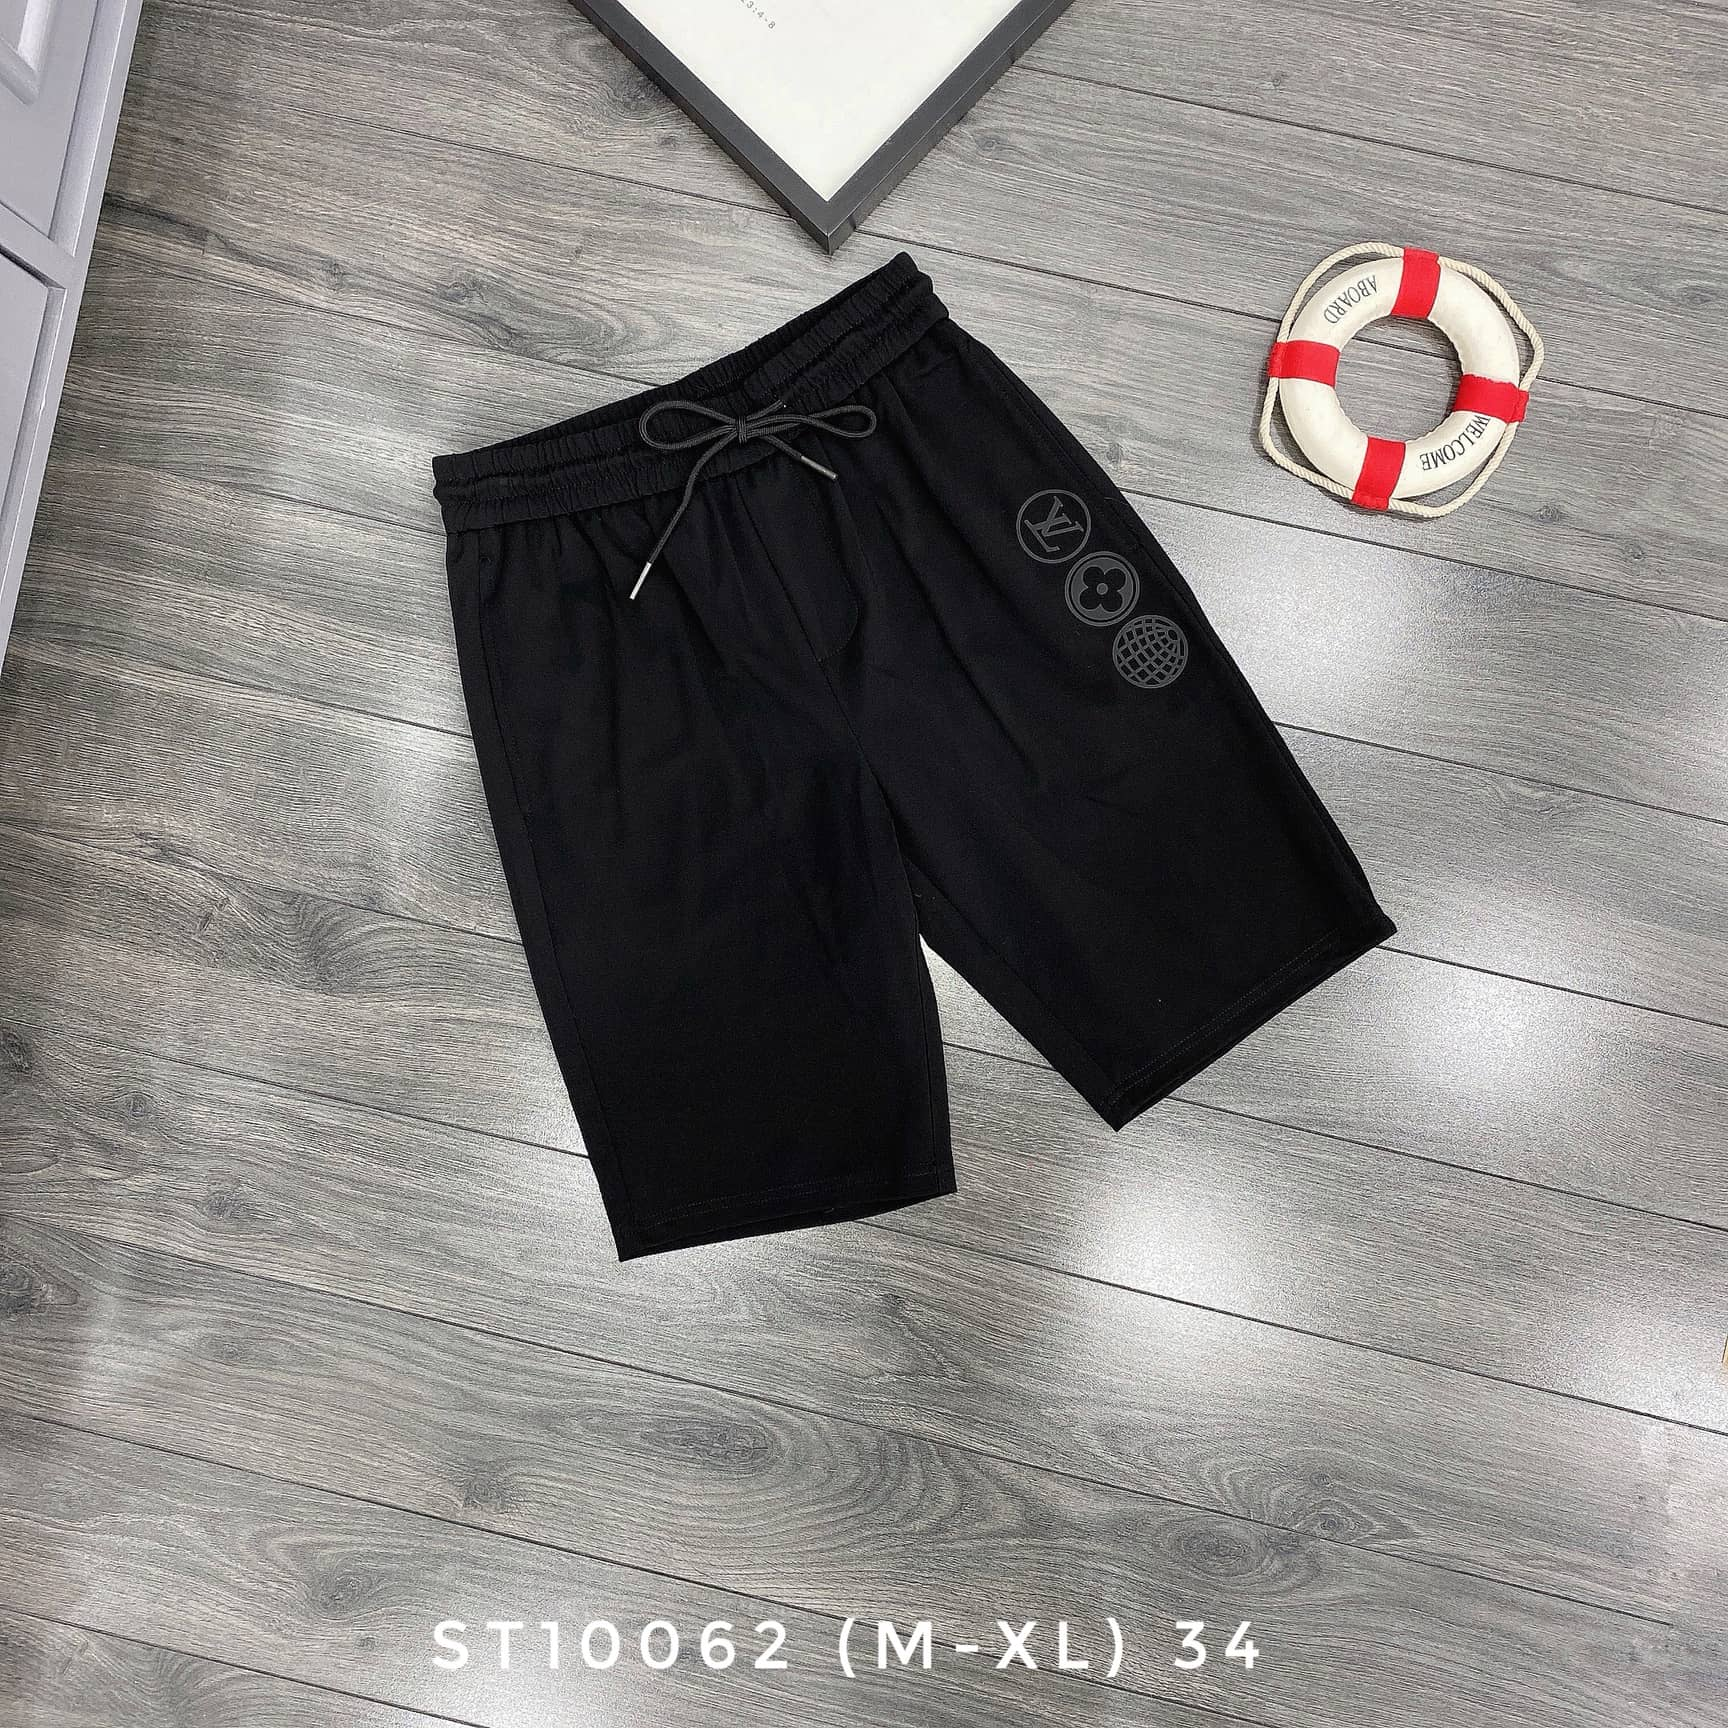 QUẦN SHORT THUN ST10062 (M-XL)